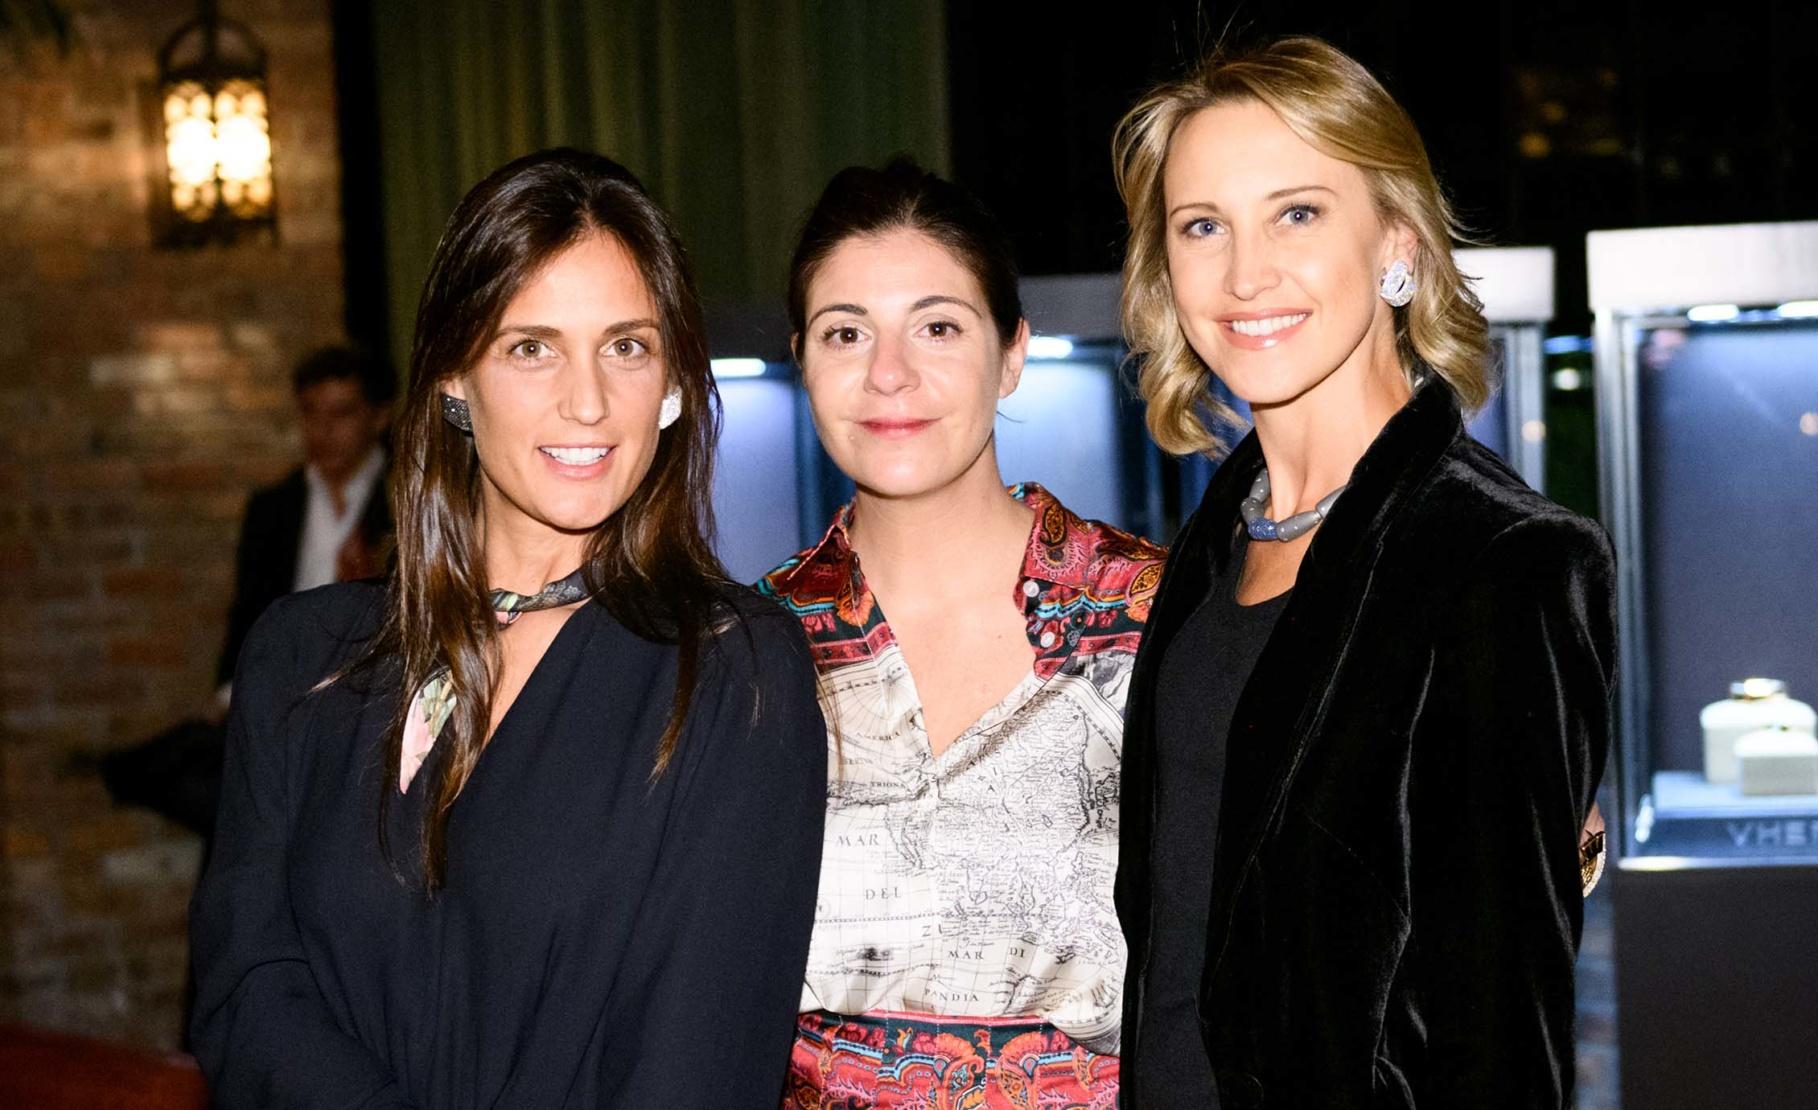 Cristiana Vigano, Maria Giulia Maramotti and Kinga Lampert